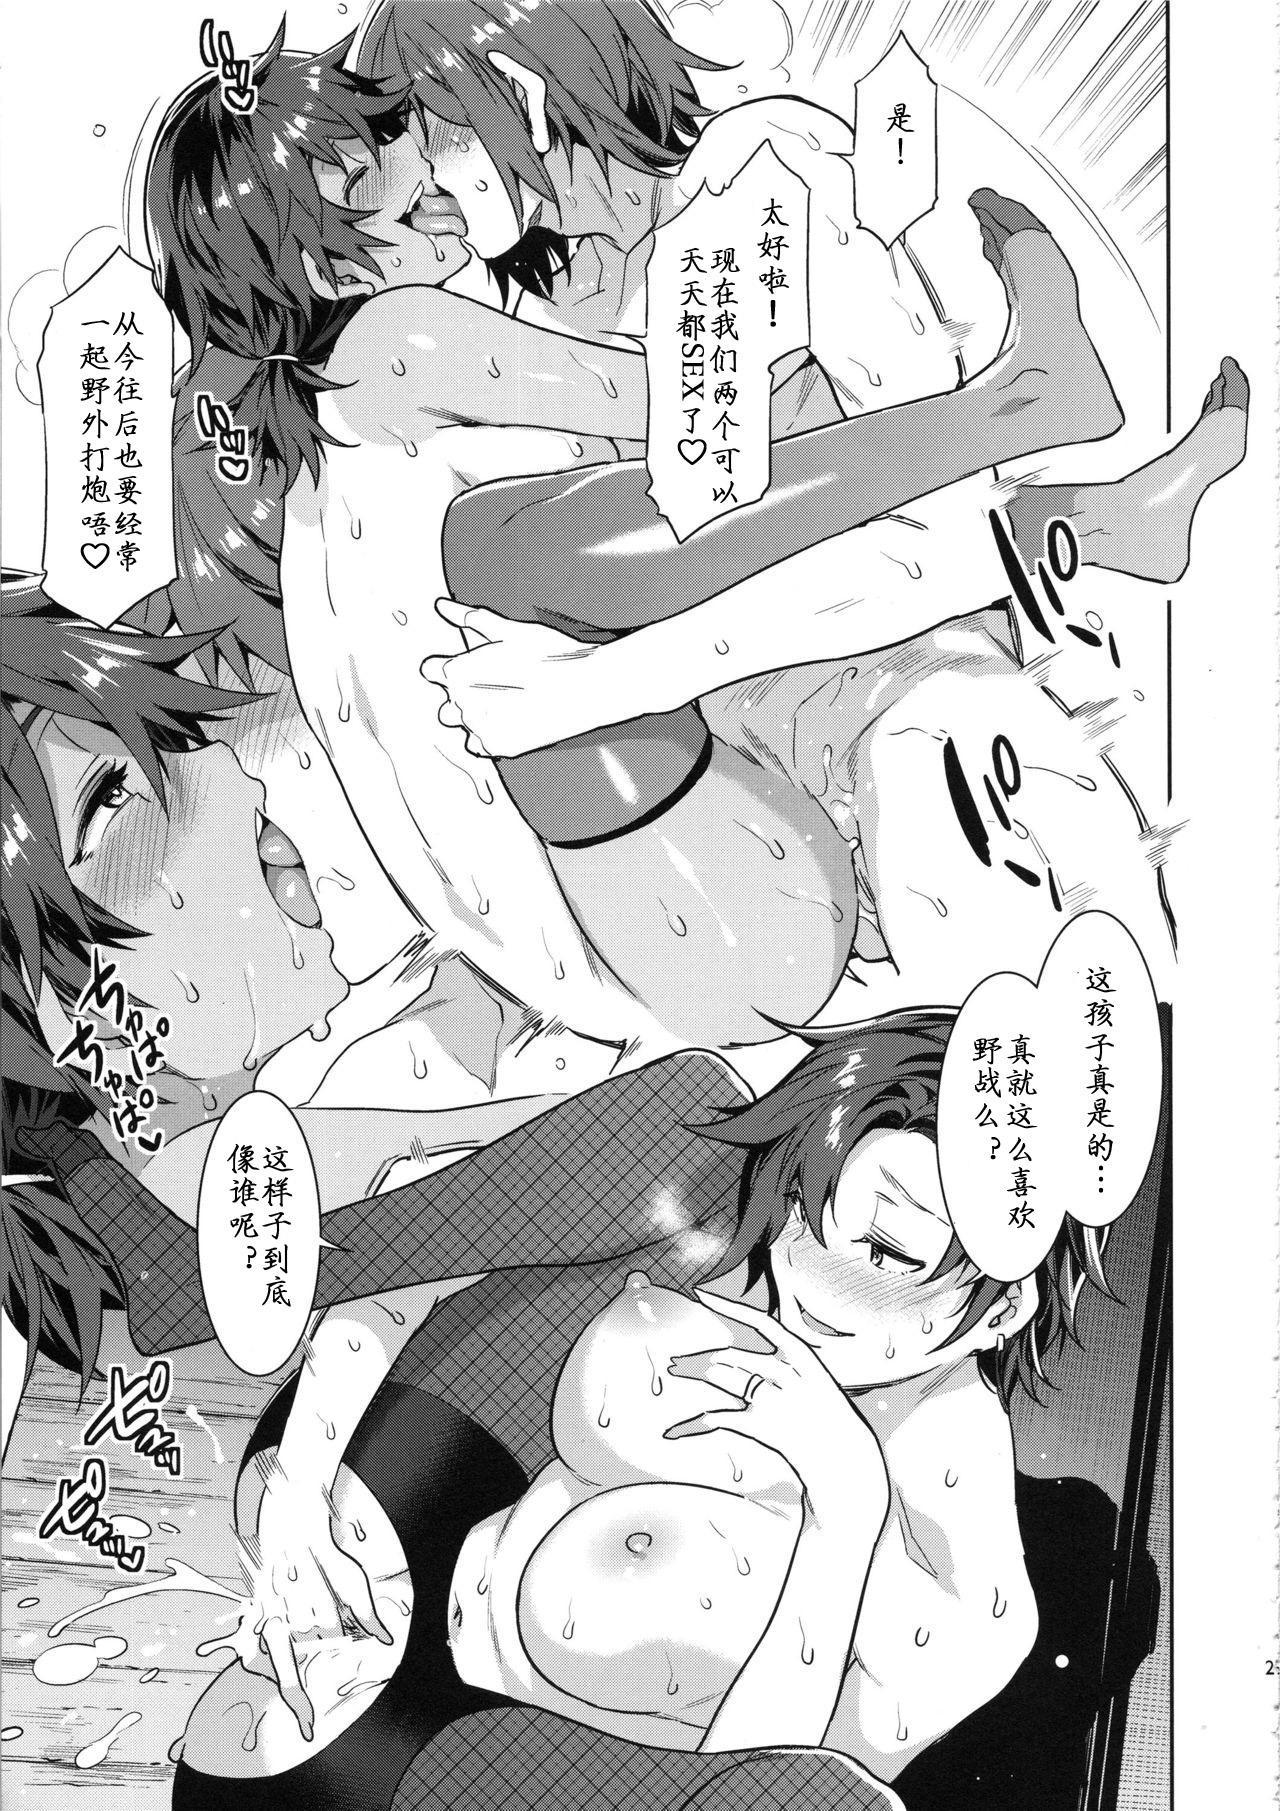 Teisou Kannen Zero no Onna Tomodachi no Haha 27